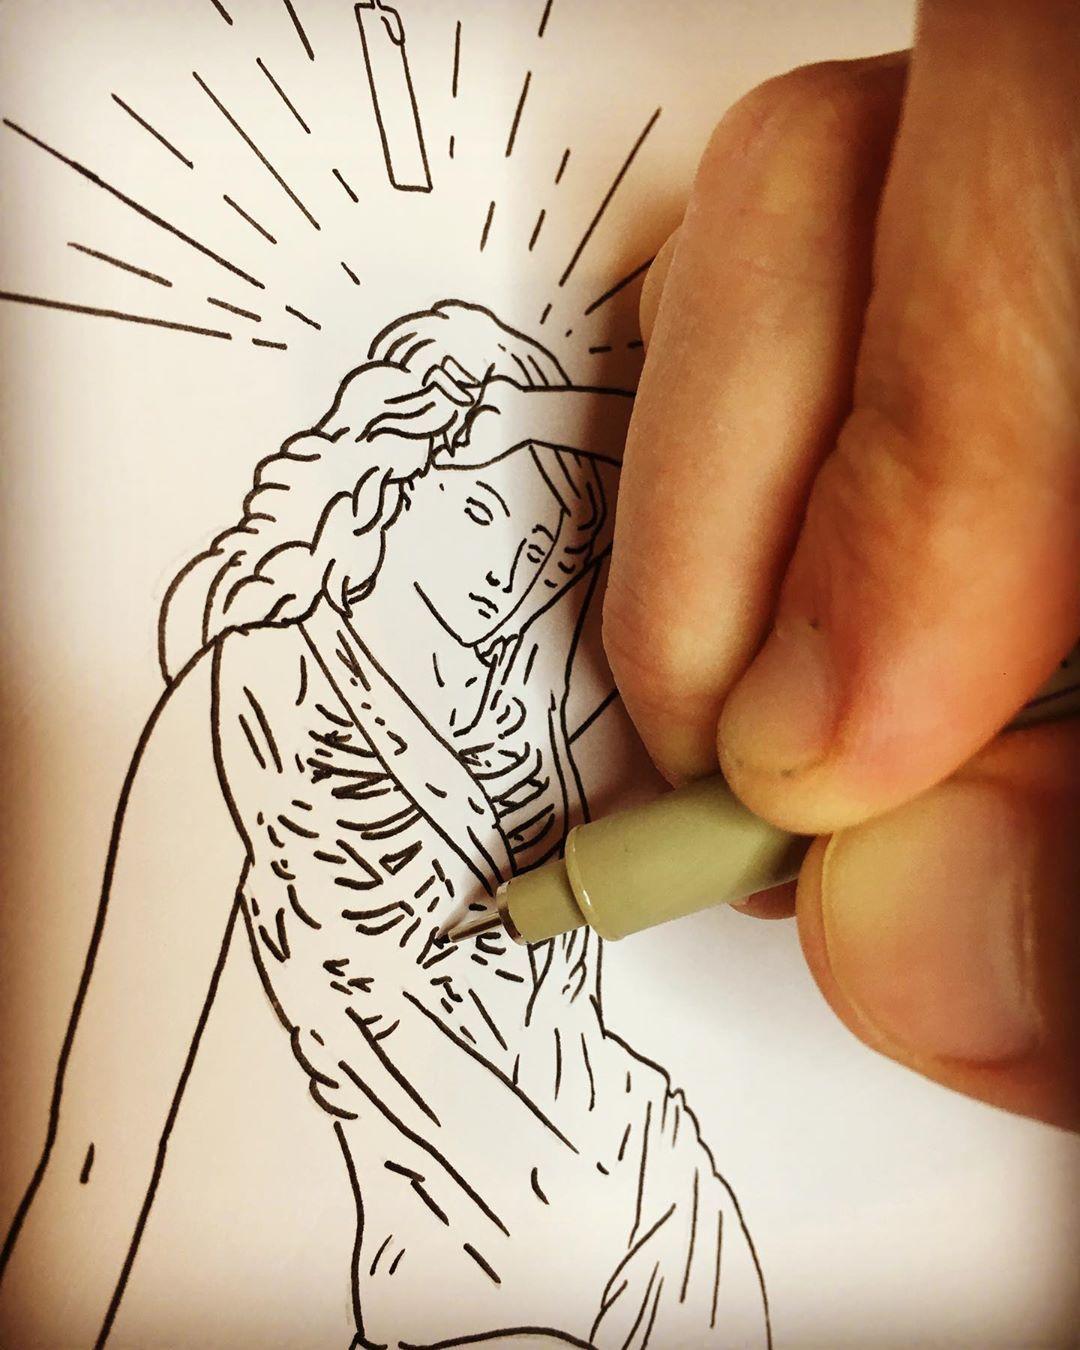 "Matthew Britton Illustration on Instagram: ""Work in progress. Tarot Card Design. #inkdrawing #pendrawing #inksketch #gothic #penandink #blackwork #blackandwhite #studiolife #wip…"""